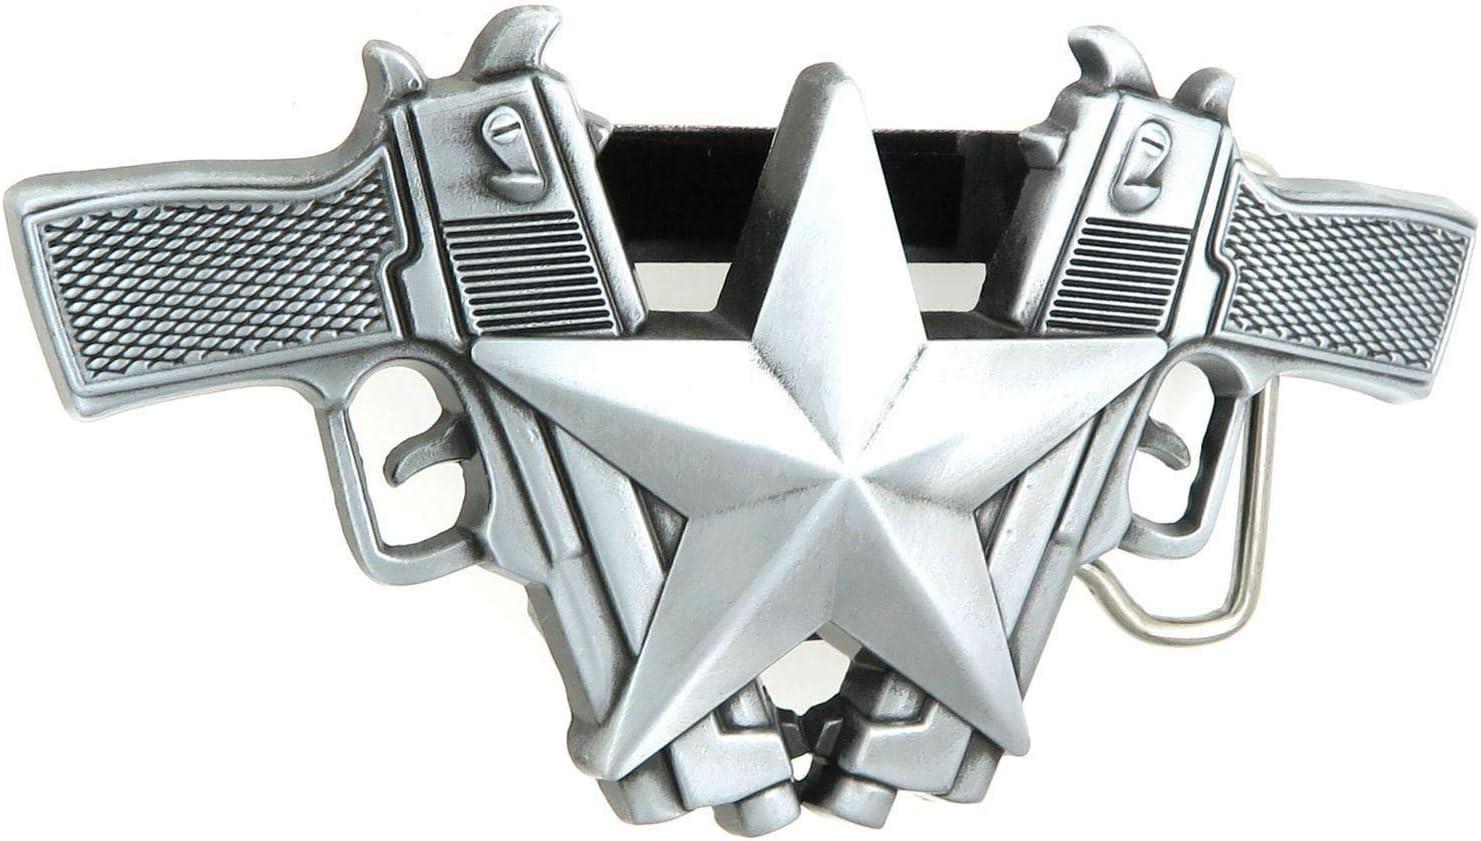 Guns Star quality assurance Under blast sales Lighter Buckle Belt Holder